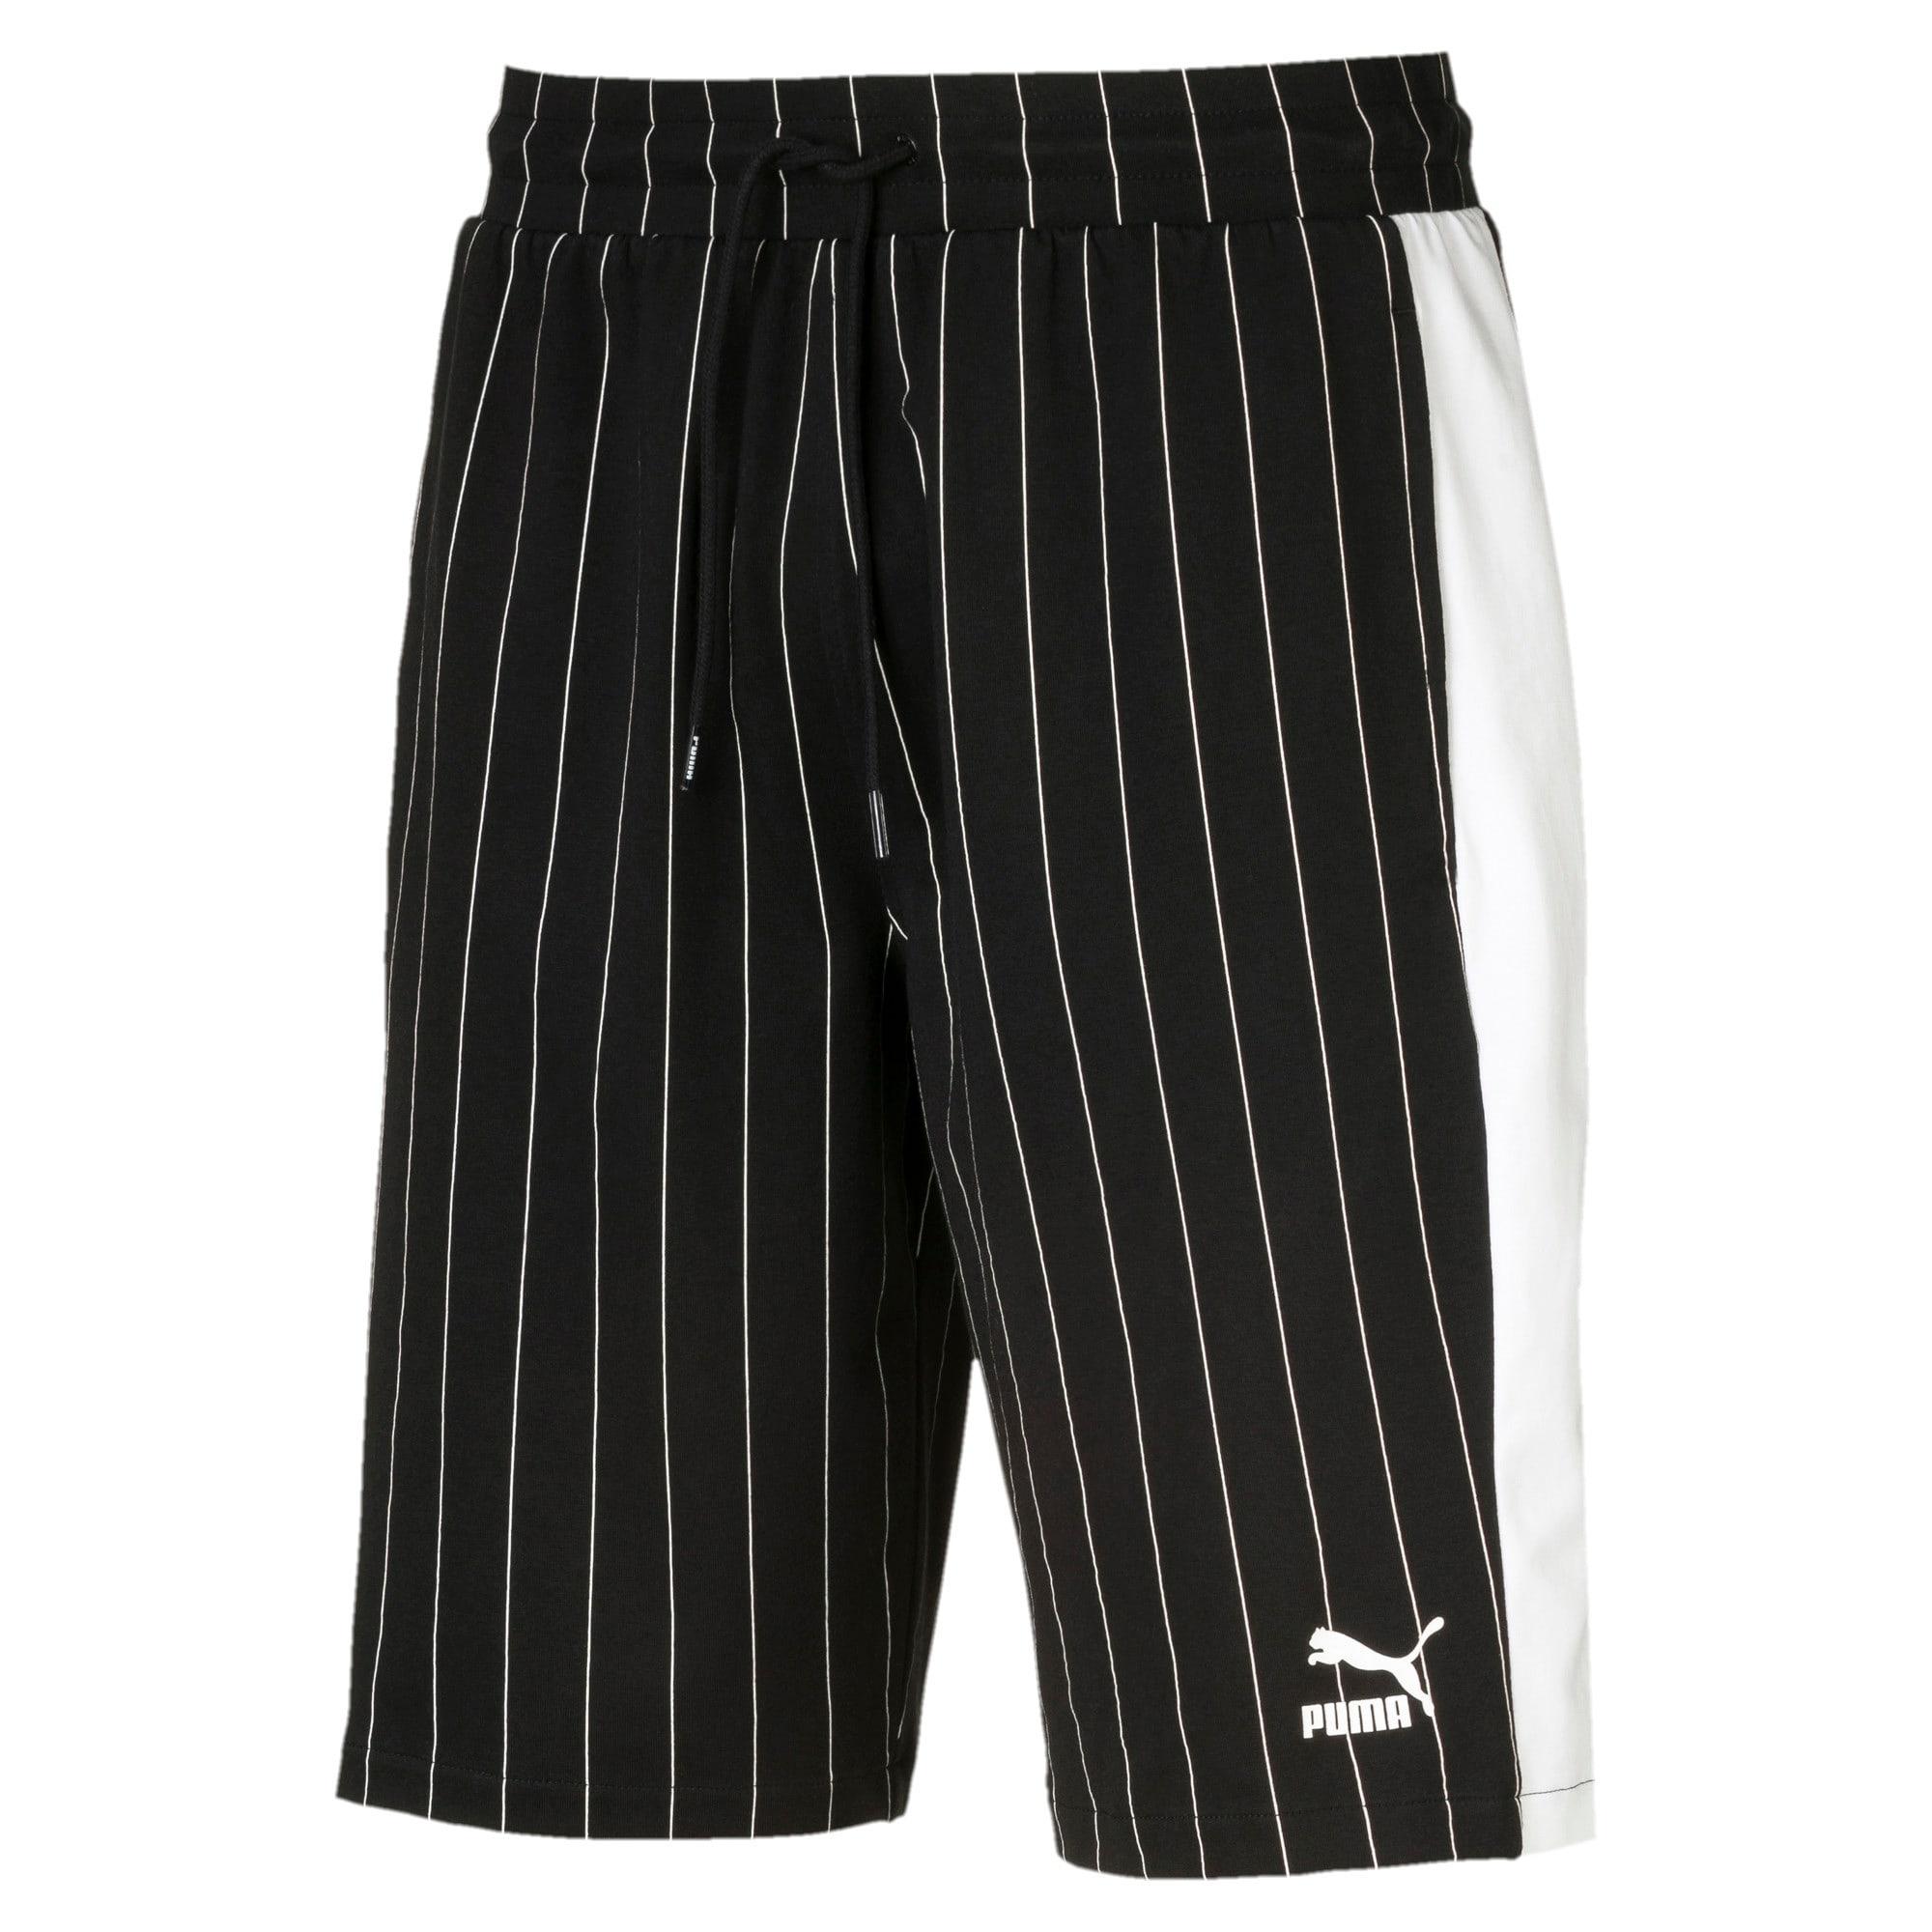 Thumbnail 1 of Archive Pinstripe Men's Shorts, Puma Black, medium